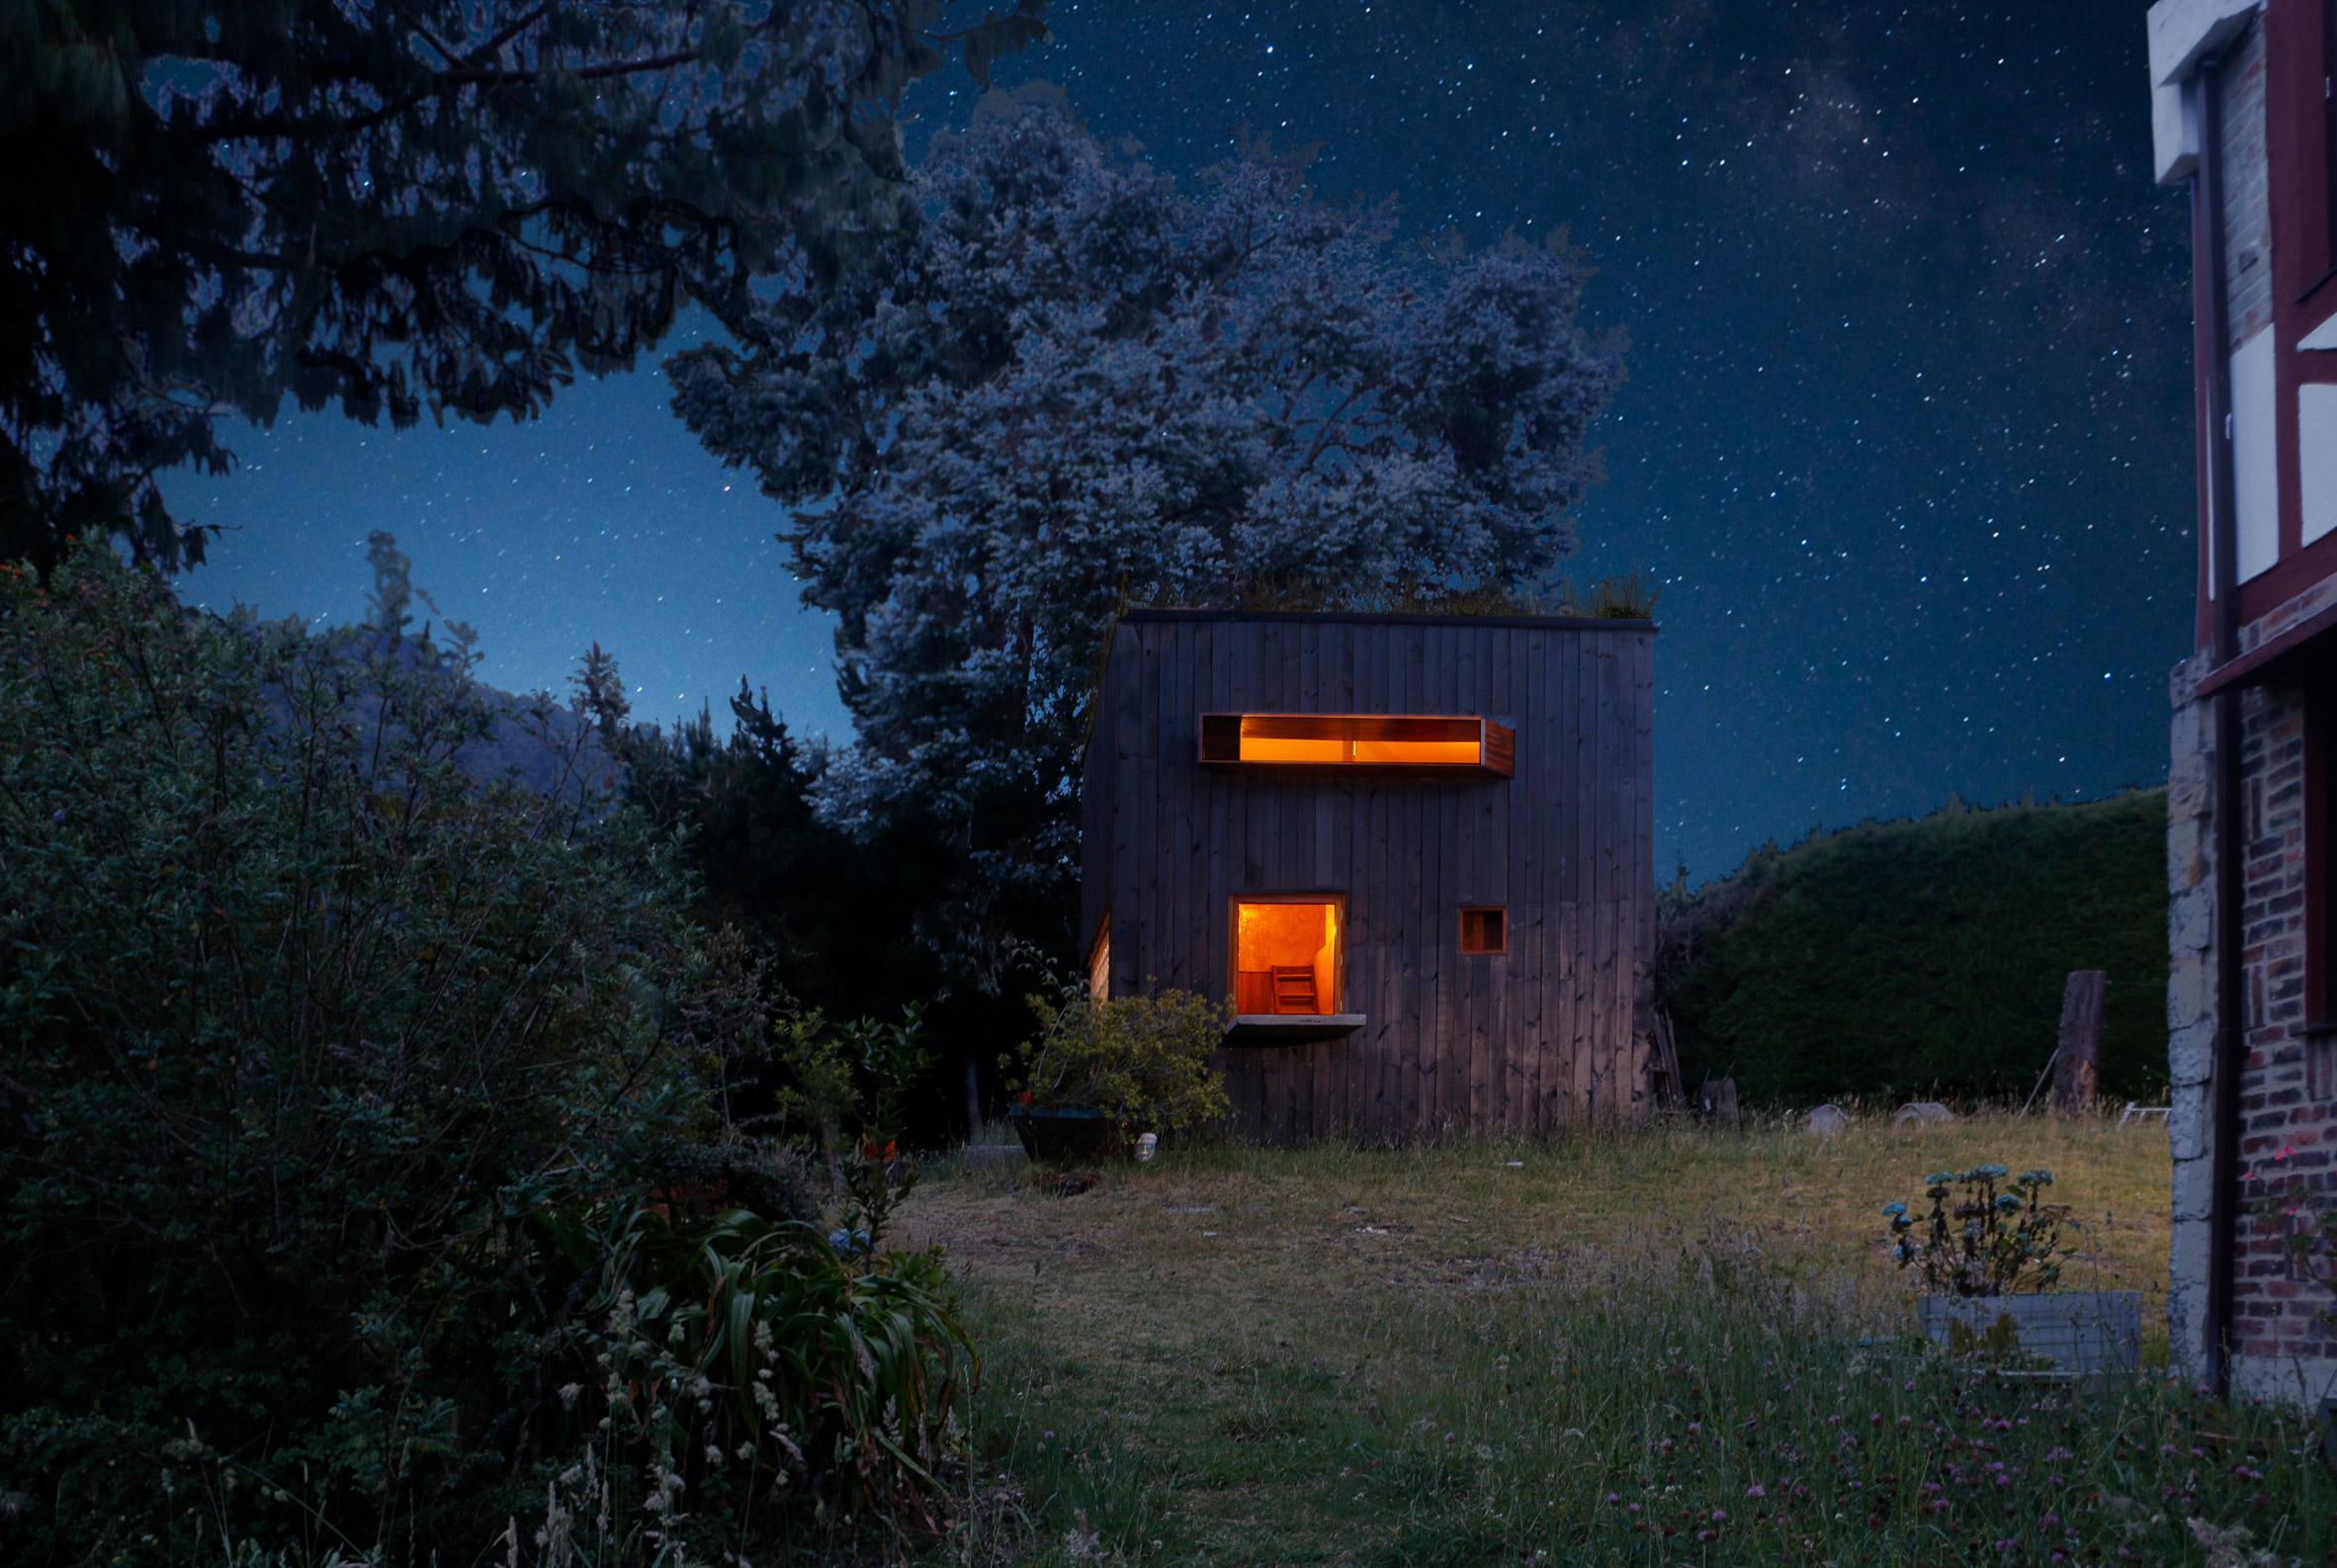 House on the Mist by Alfonso Arango